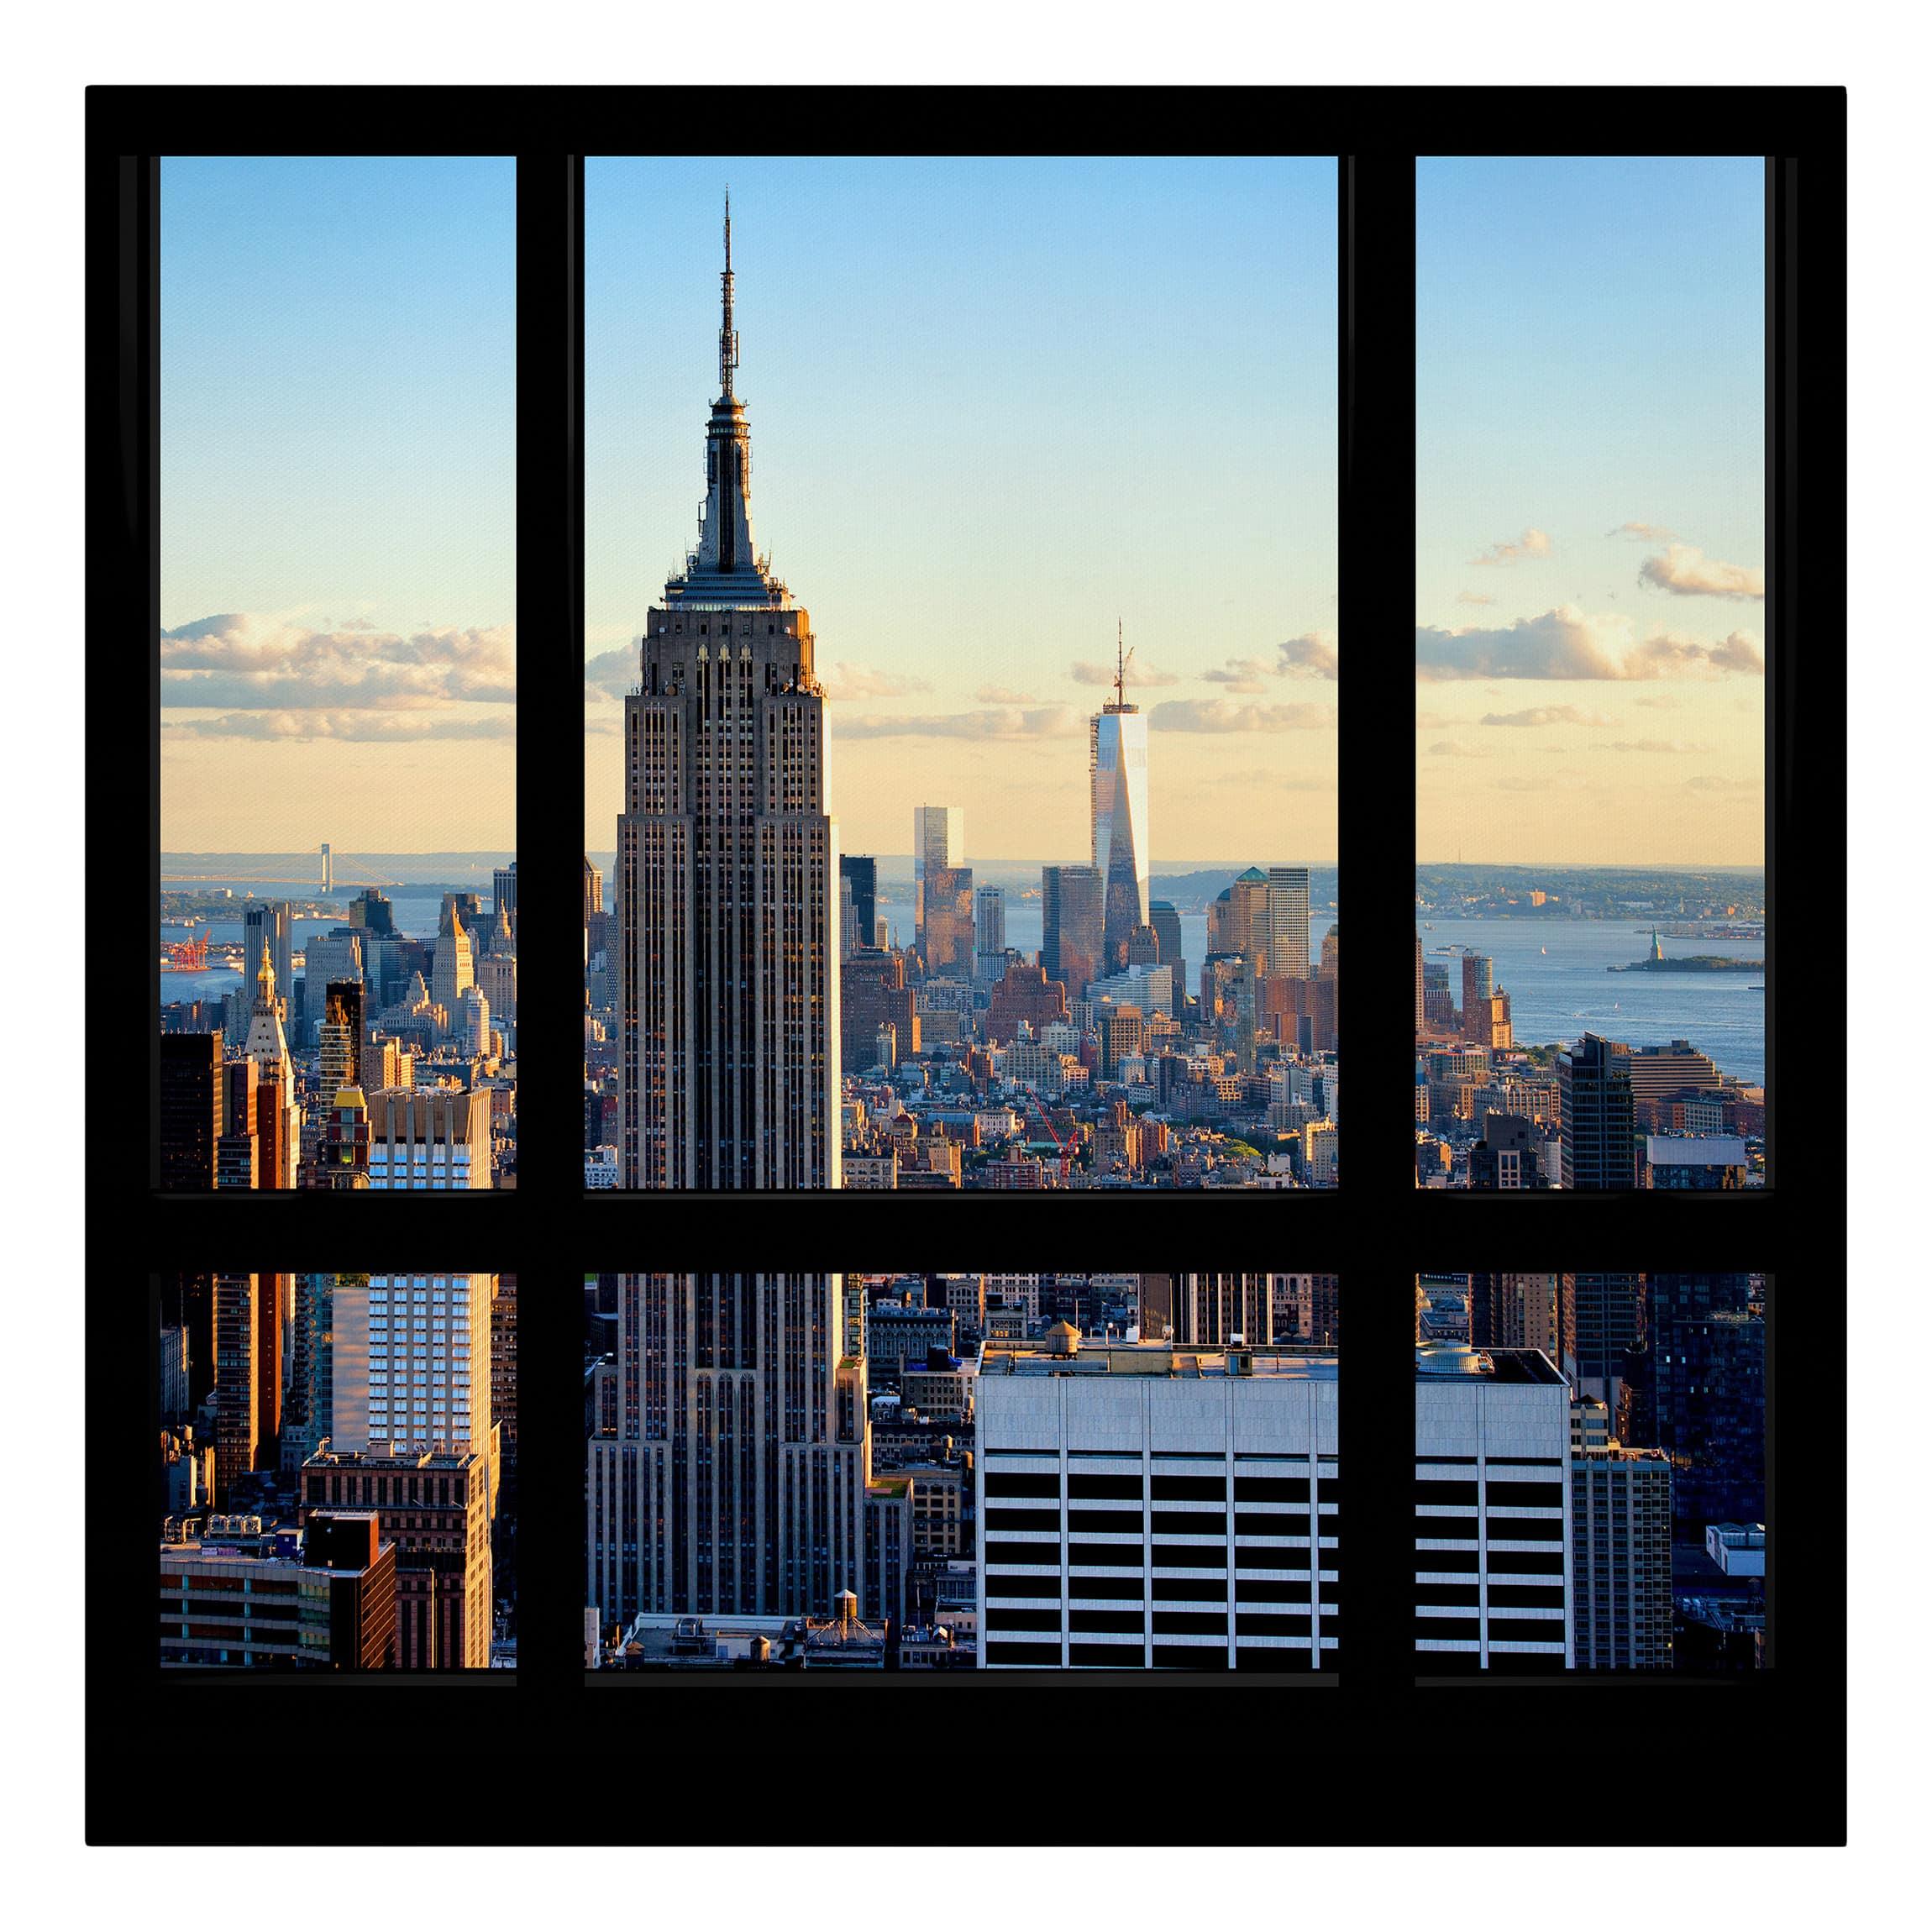 leinwandbild new york fensterblick auf empire state building quadrat 1 1. Black Bedroom Furniture Sets. Home Design Ideas